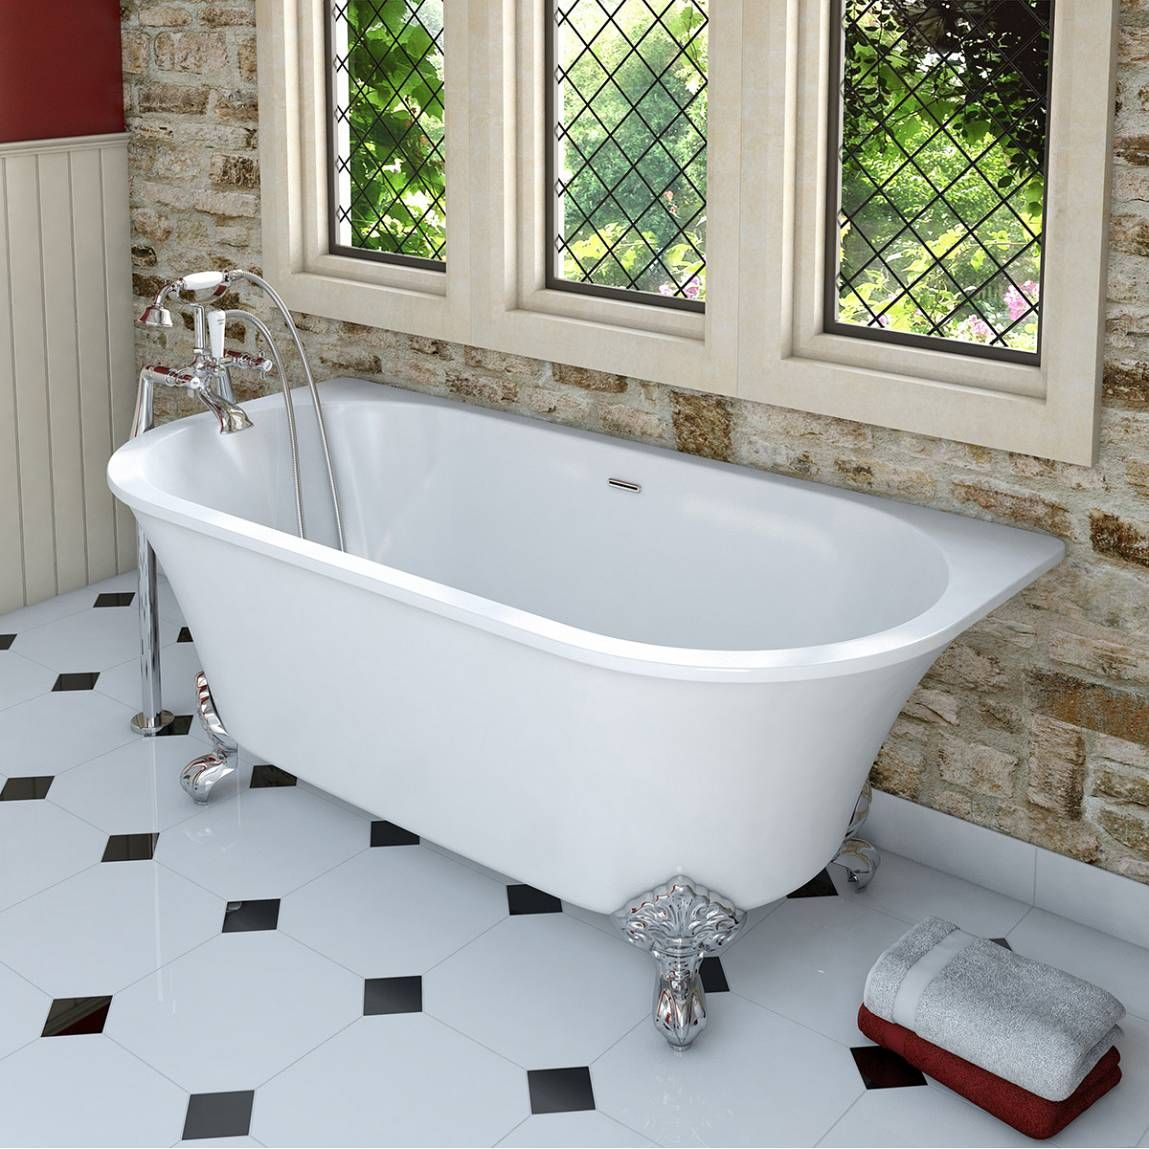 camberley back to wall bath with ball feet - Bathroom Accessories Victoria Plumb